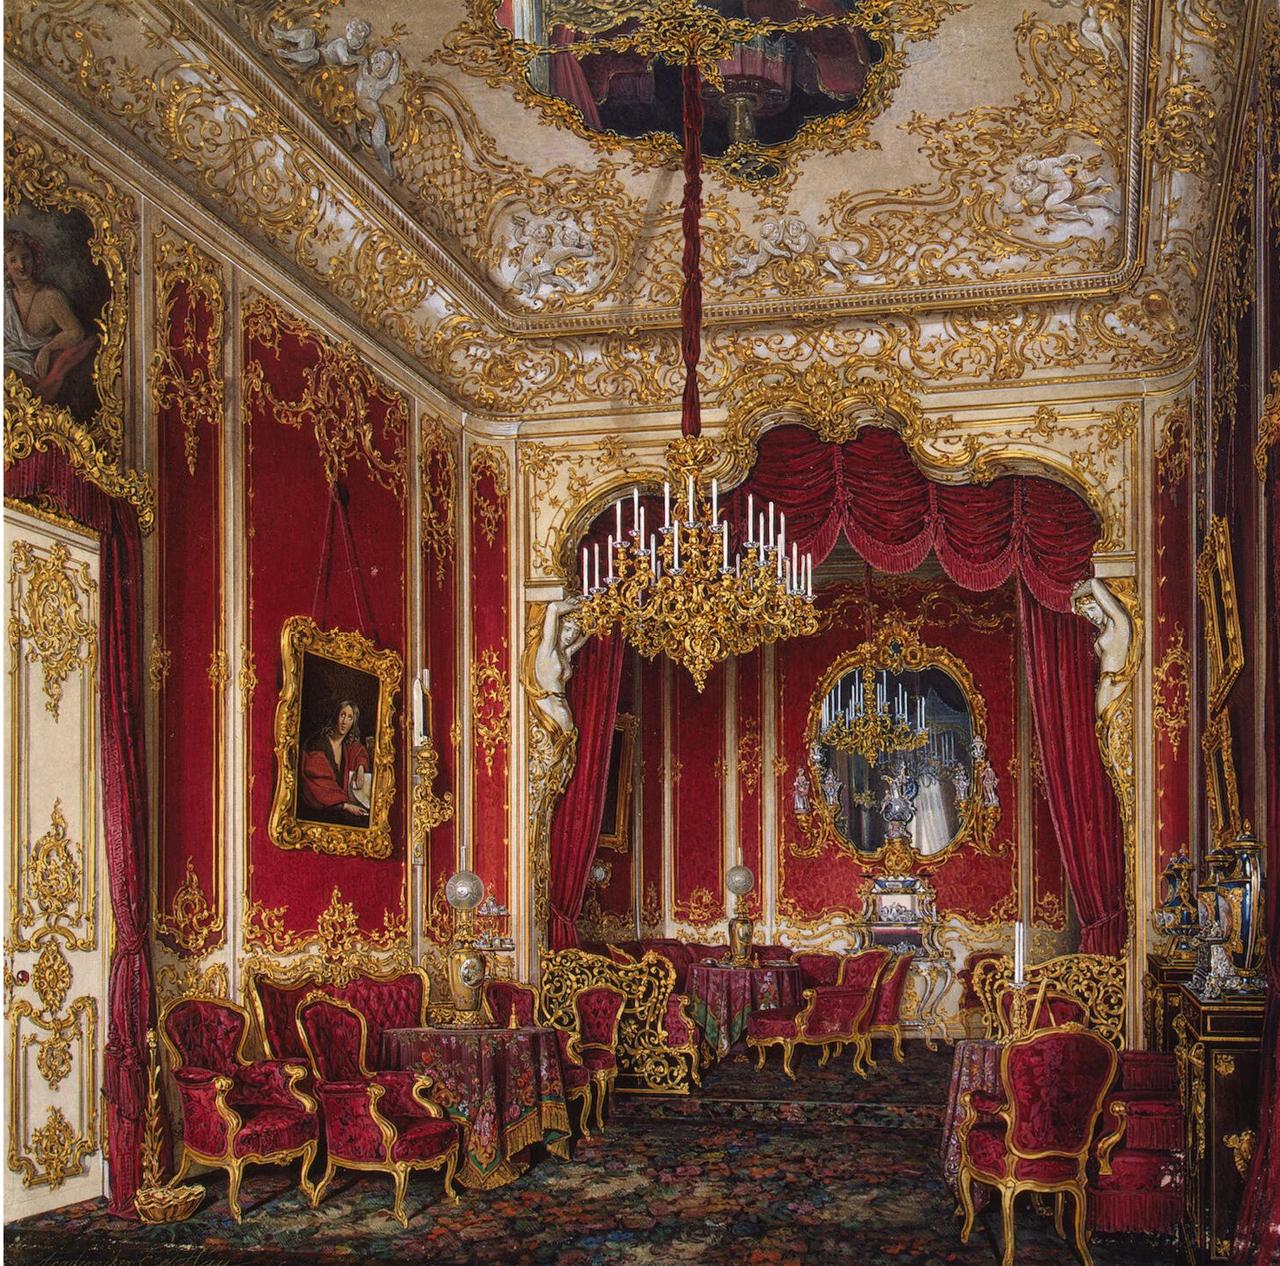 Интерьеры Зимнего дворца. Будуар императрицы Марии Александровны